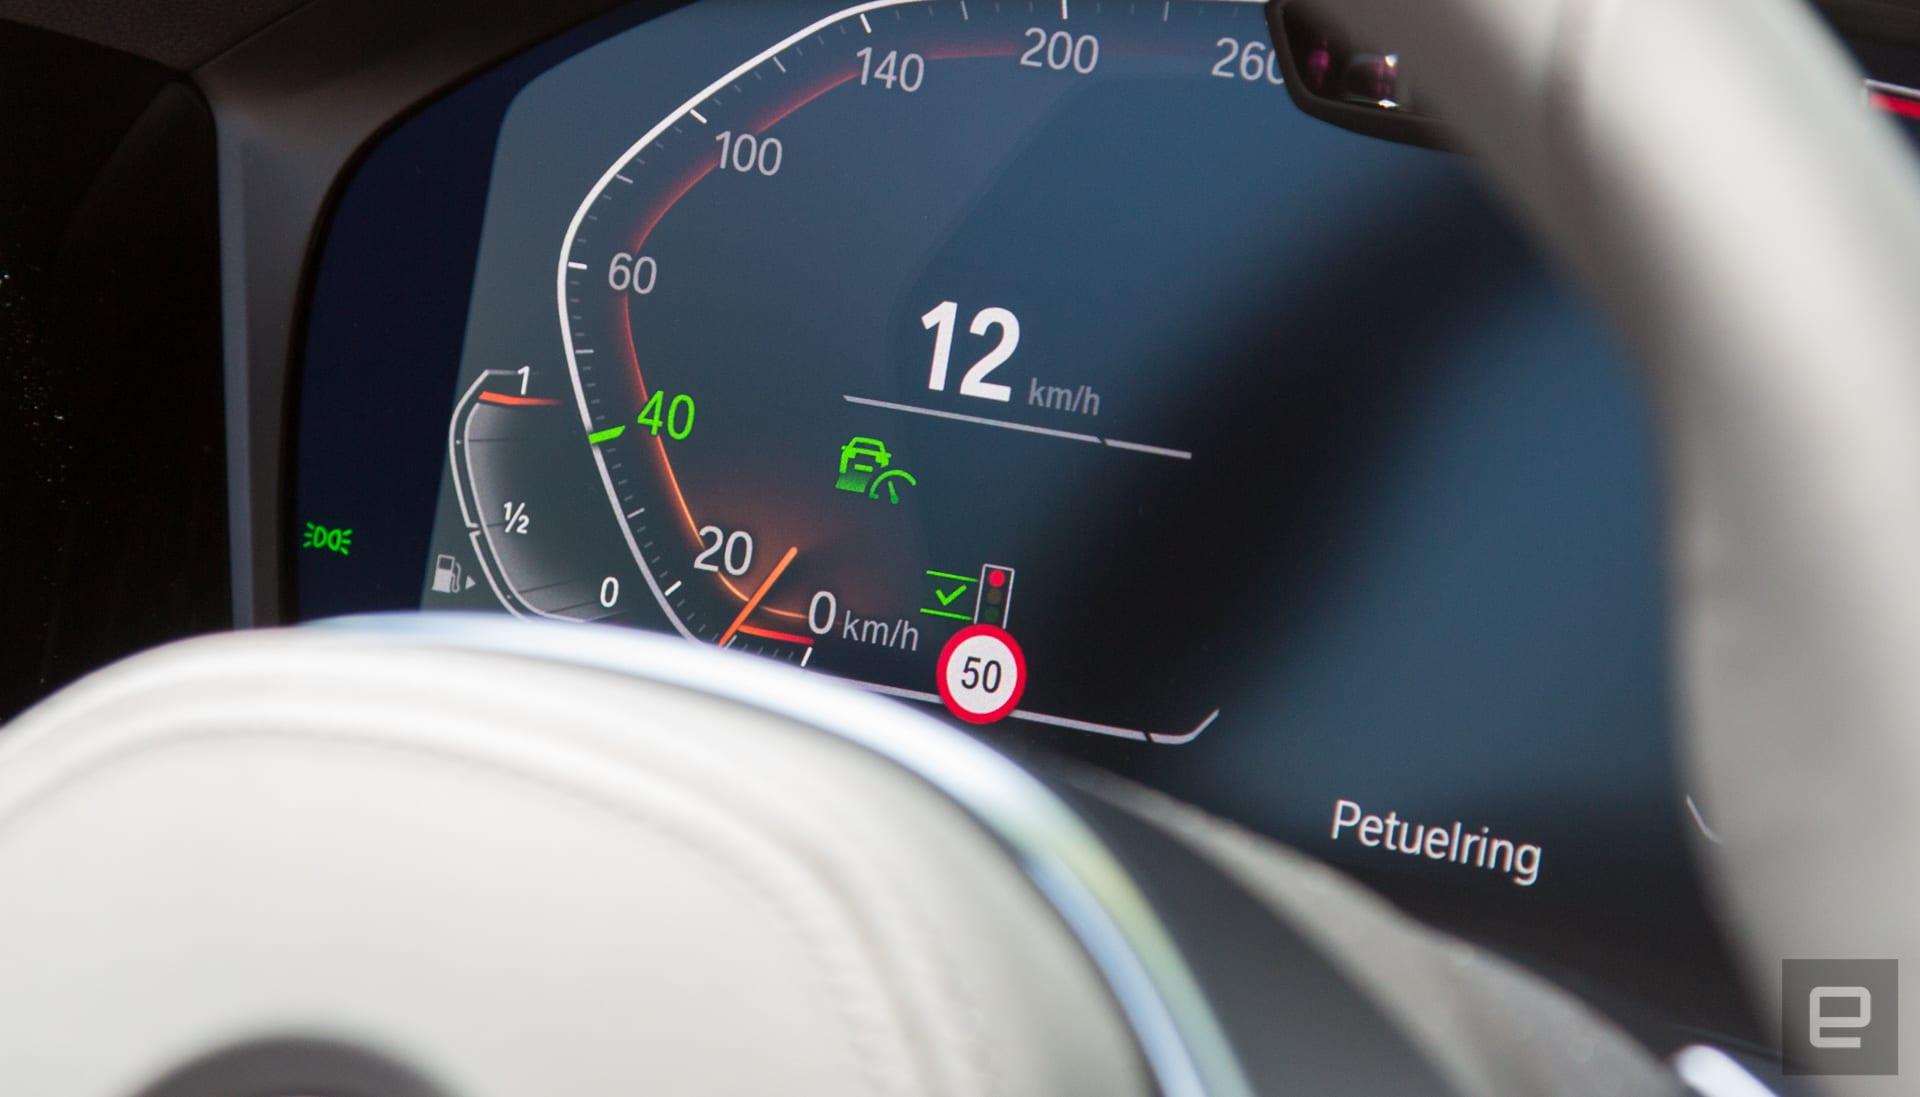 BMW cruise control traffic light demo